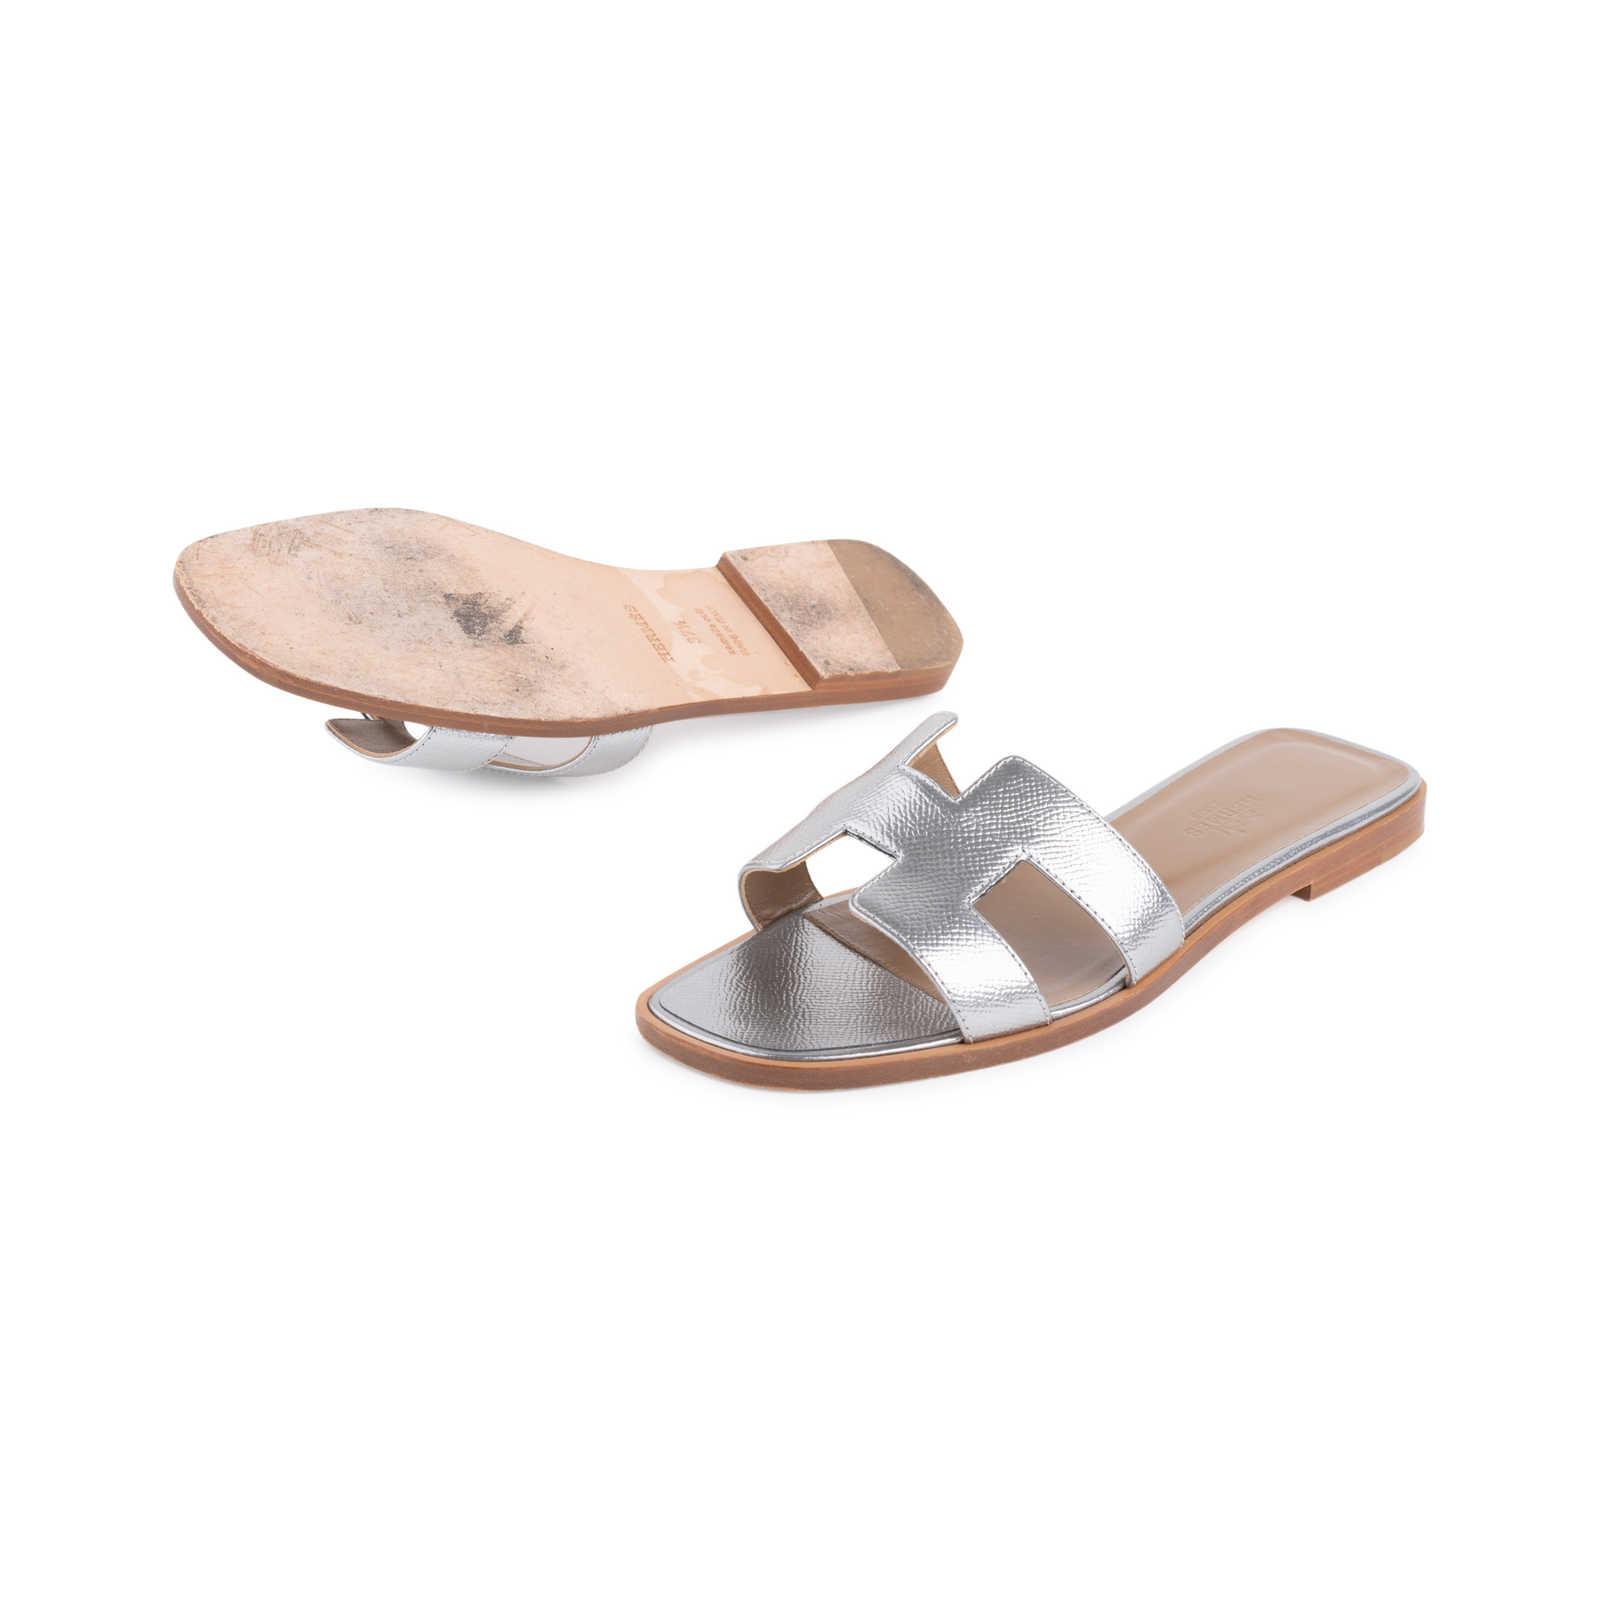 0a447b5f7585 ... Authentic Second Hand Hermès Metallic Epsom Oran Sandals  (PSS-126-00139) ...